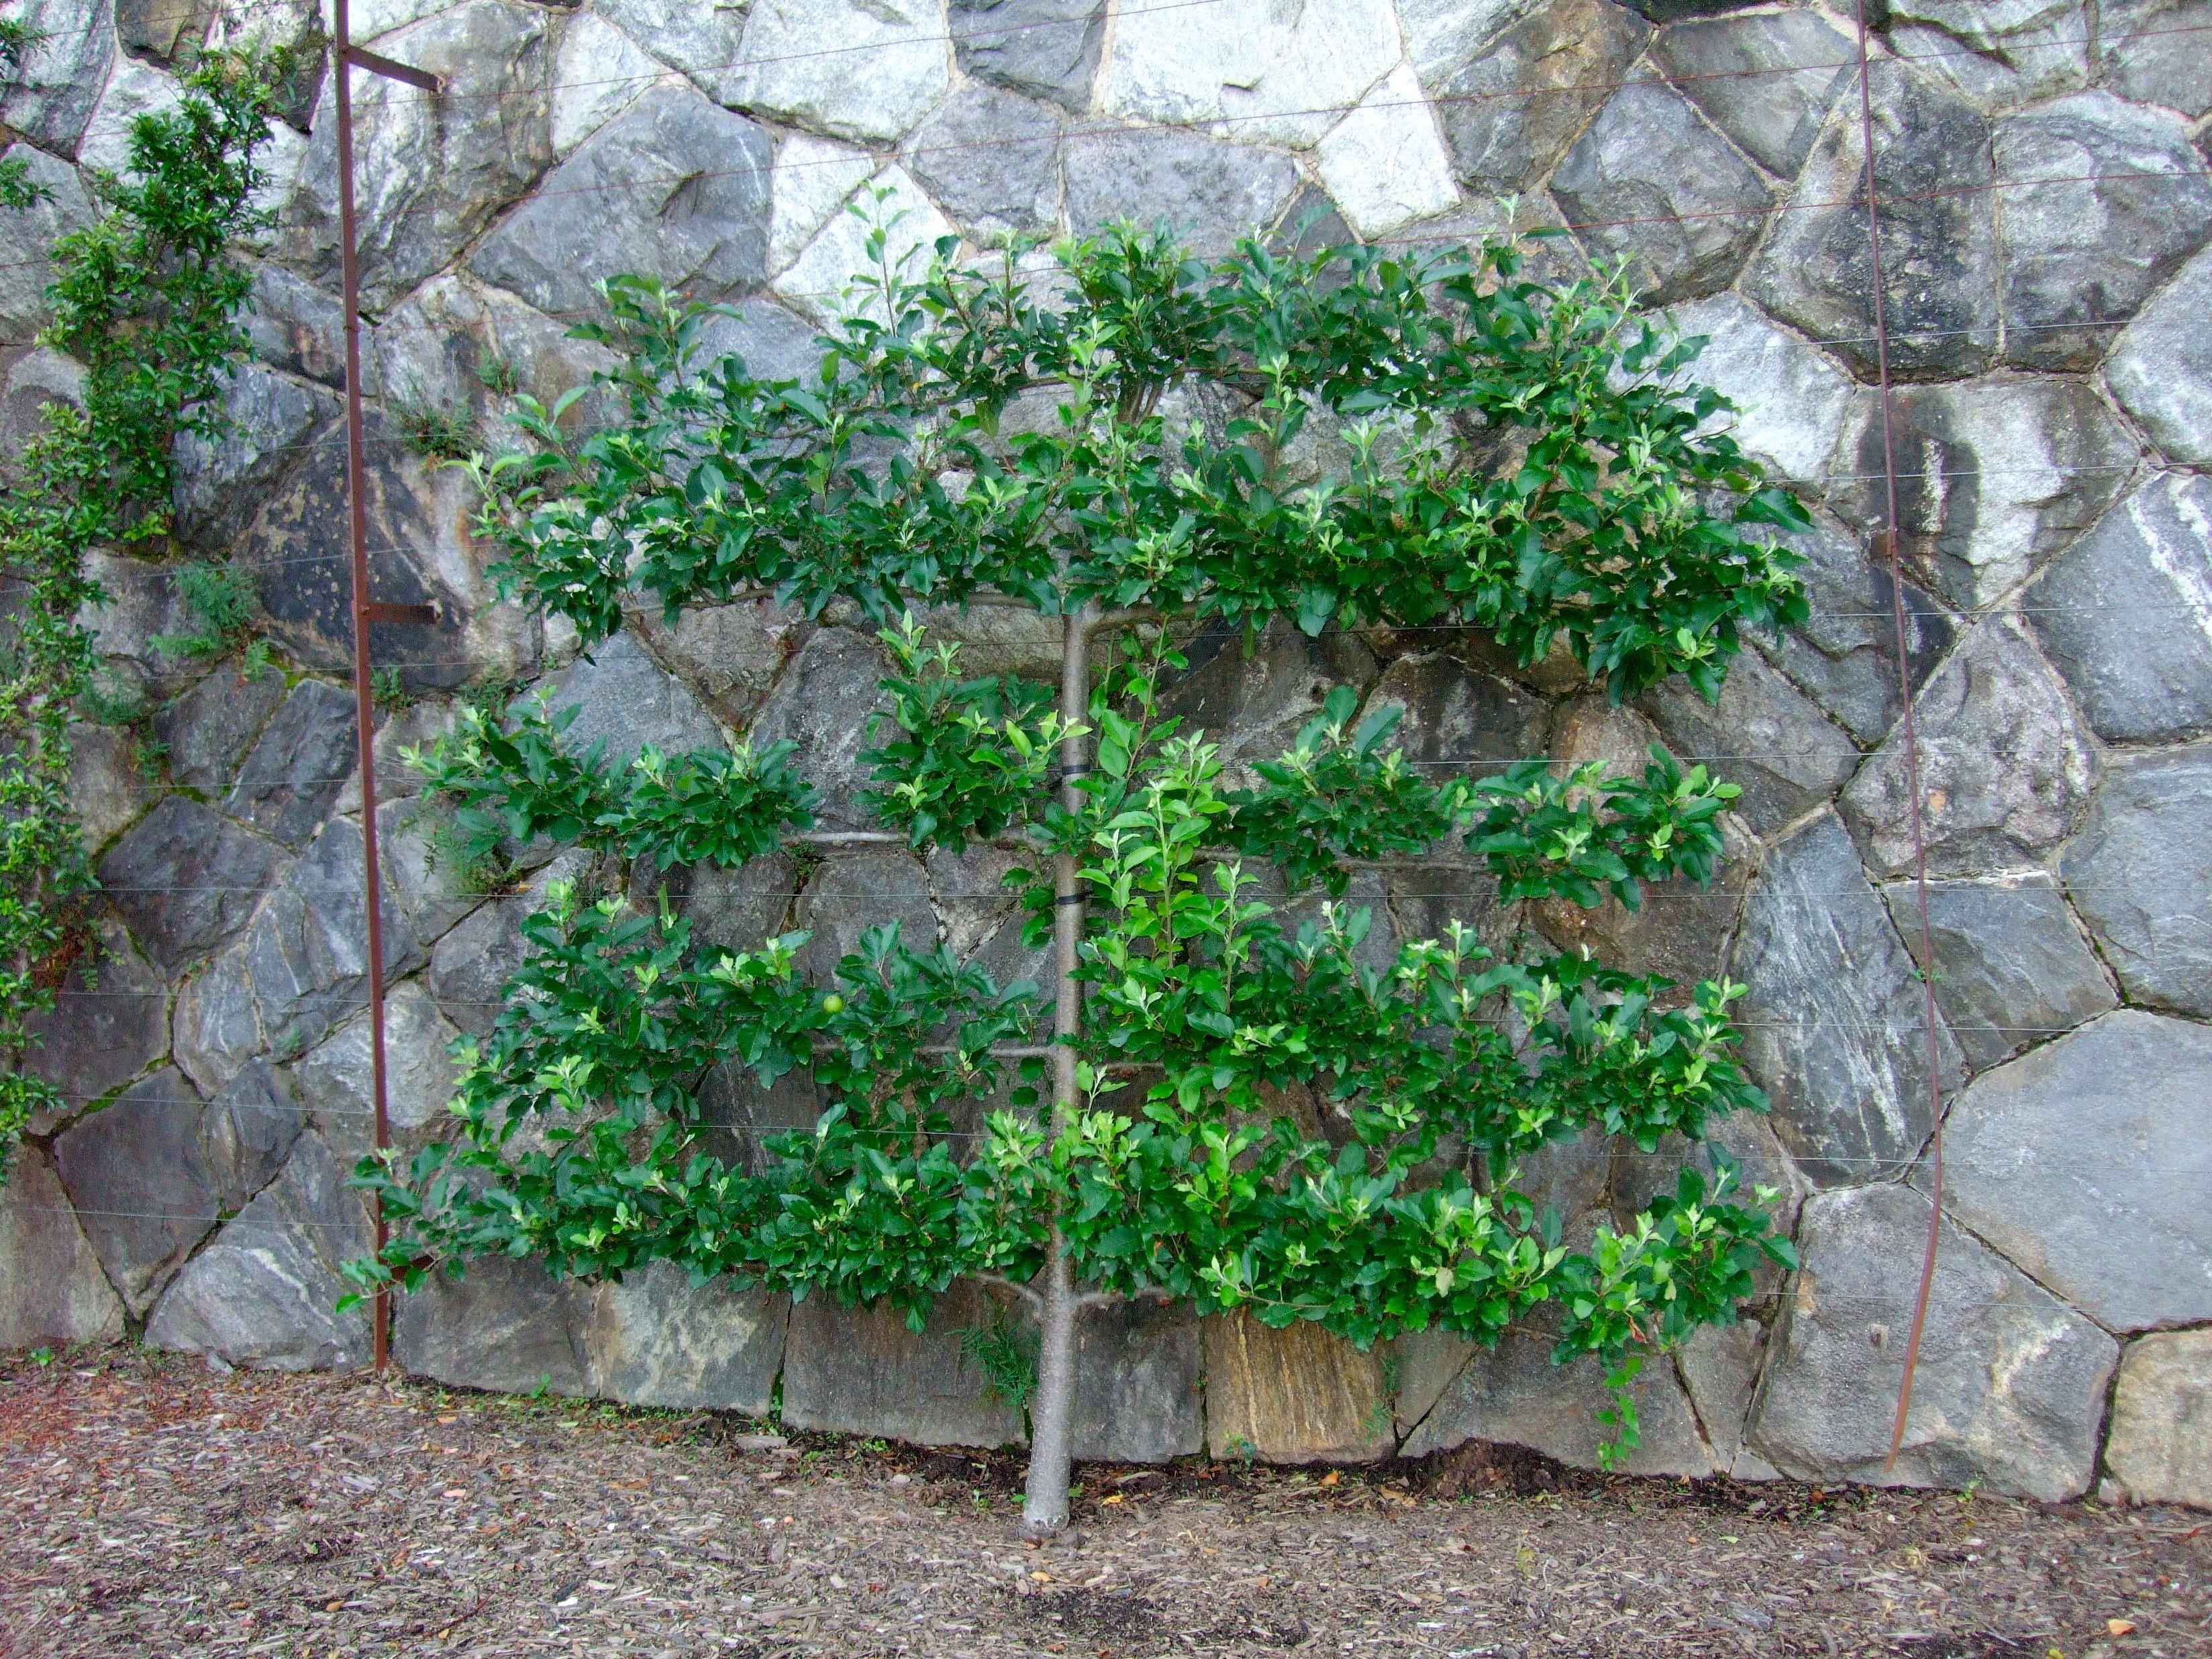 Grow Dwarf Fruit Trees Against A Wall Dwarf Fruit Trees Fruit